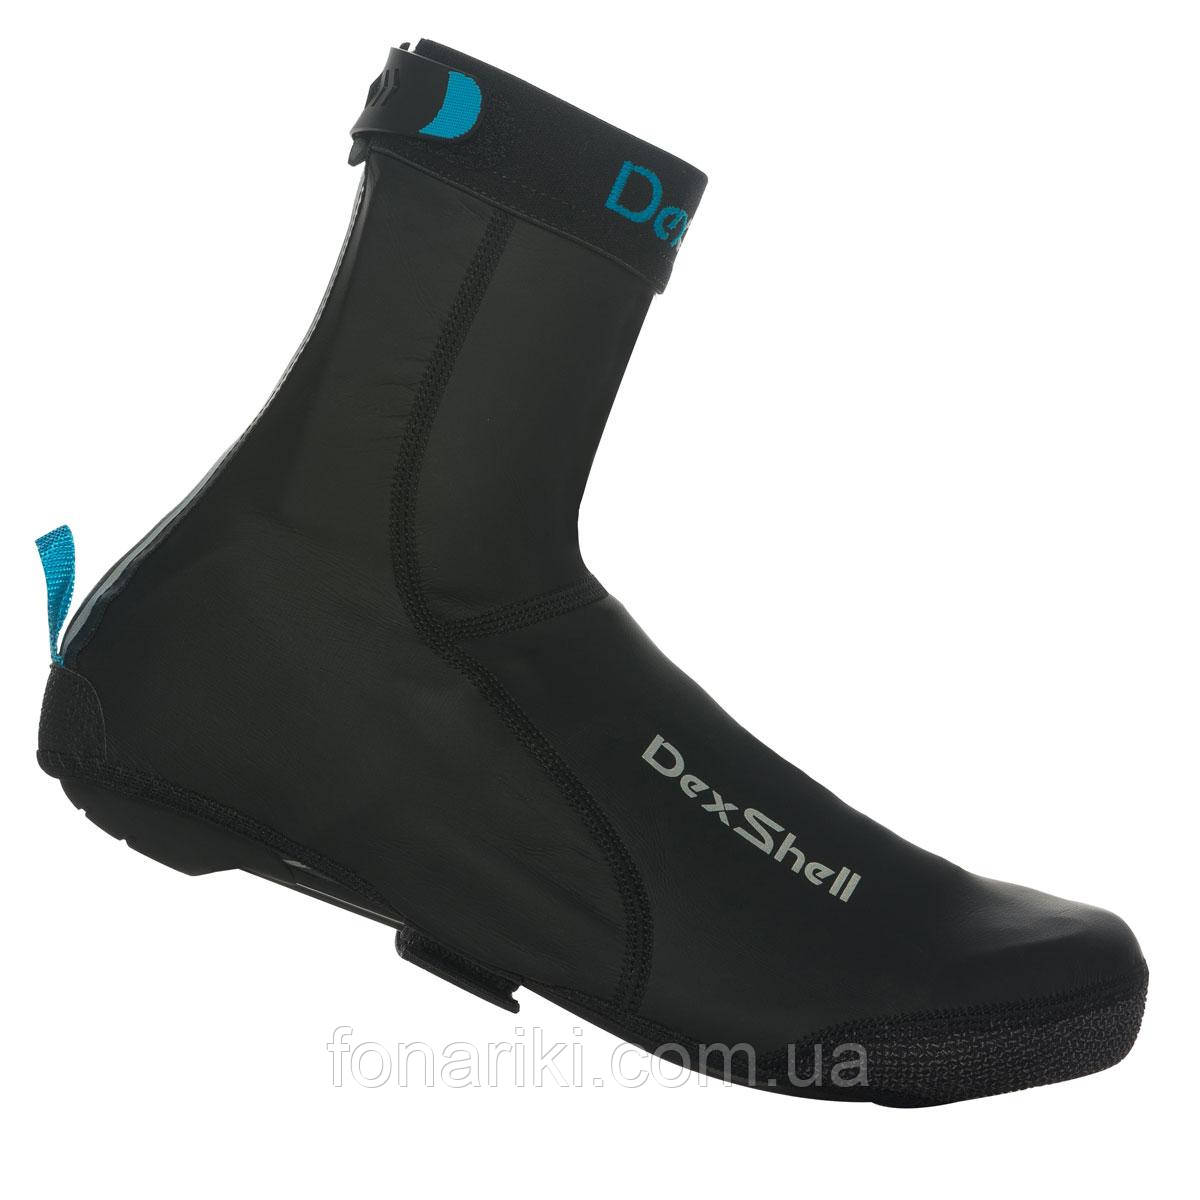 Dexshell Light weight Overshoes S 36-38 Велосипедные бахилы водонепроницаемые